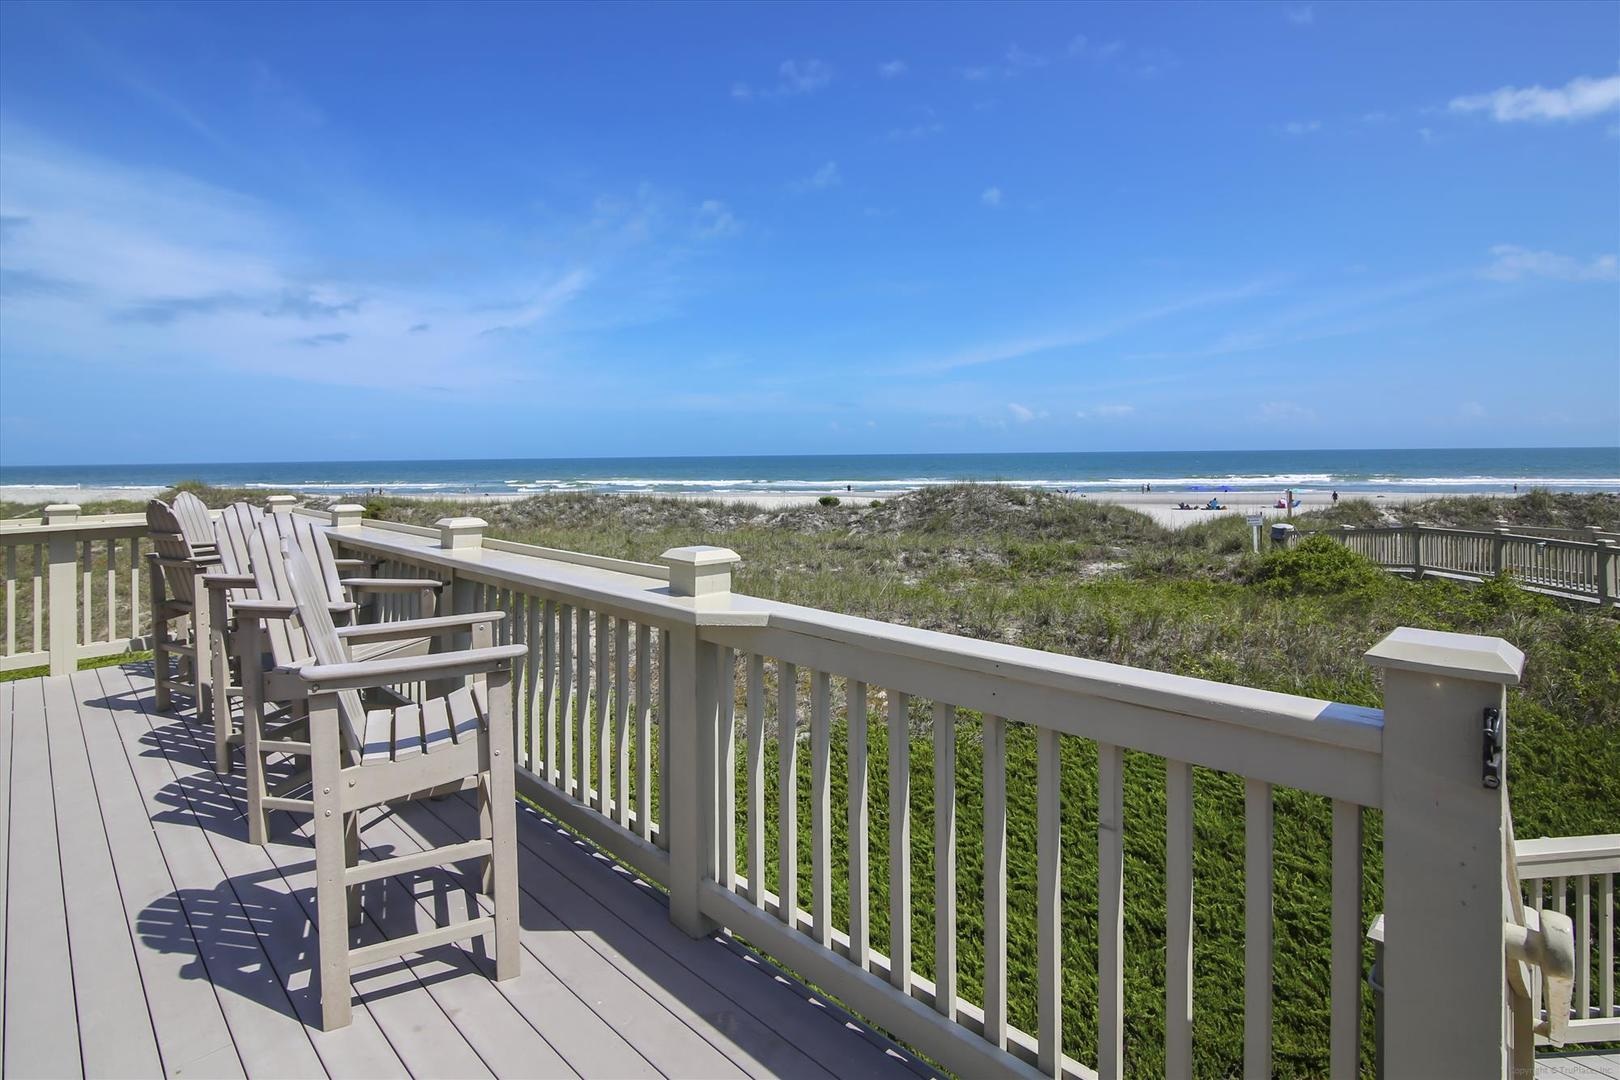 Ocean Creek Beach Cabana Grill - Deck with View